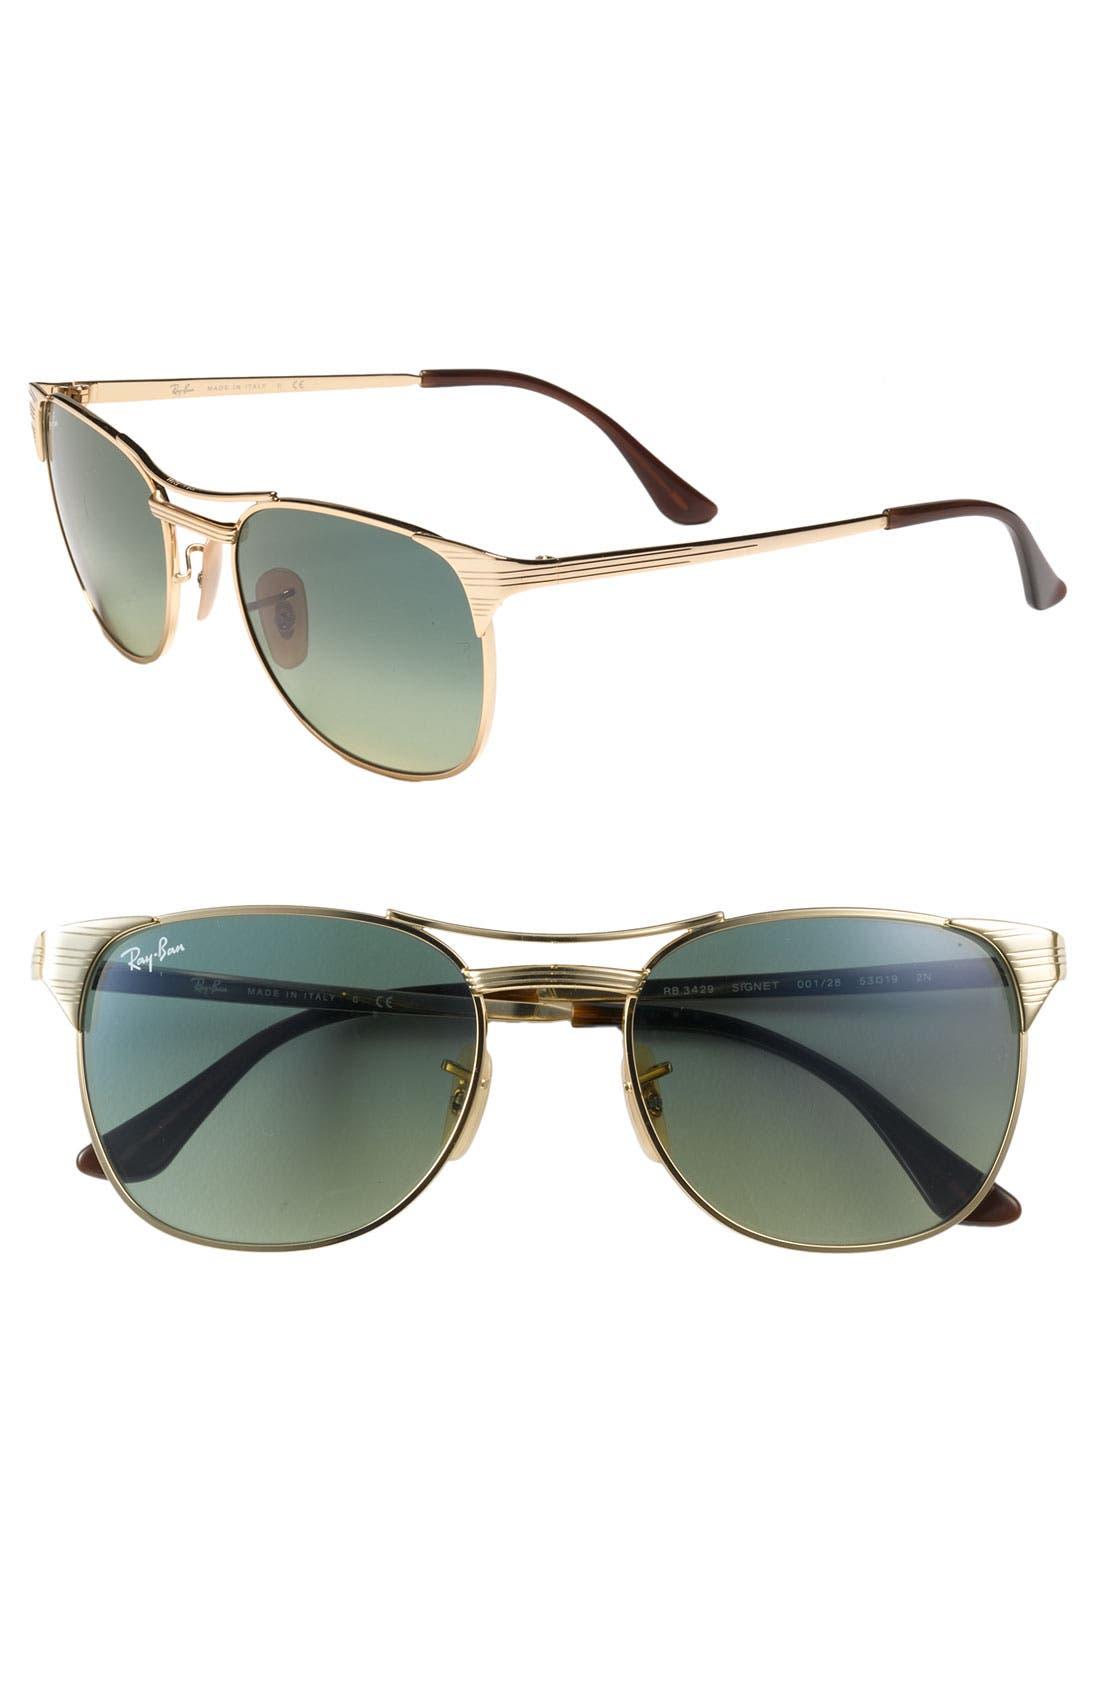 Main Image - Ray-Ban Metal Cat's Eye Aviator Sunglasses